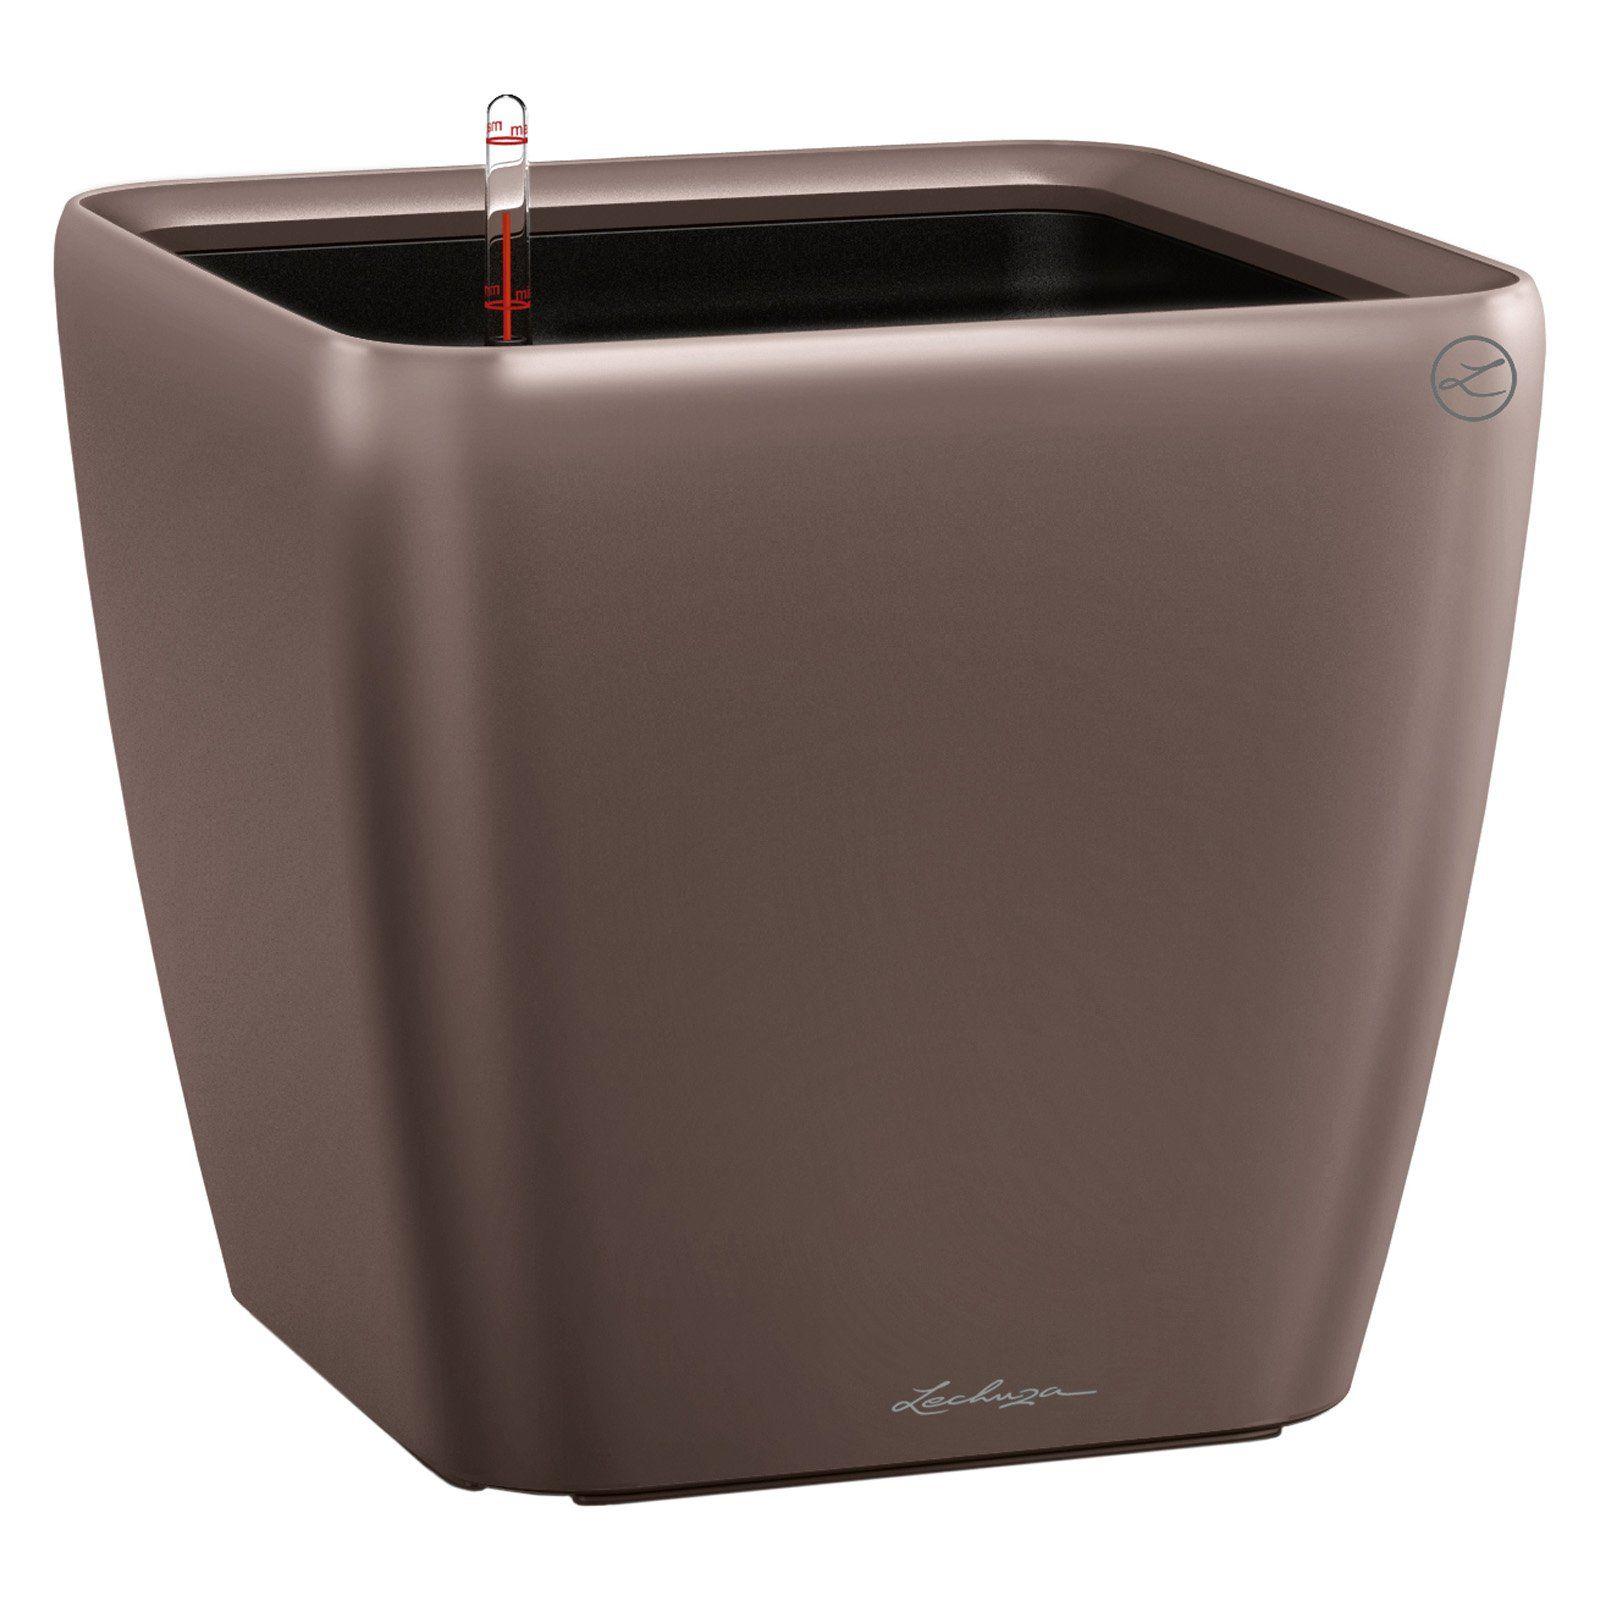 Lechuza Quadro Premium LS Indoor/Outdoor Self-Watering Planter Espresso Metallic #selfwatering